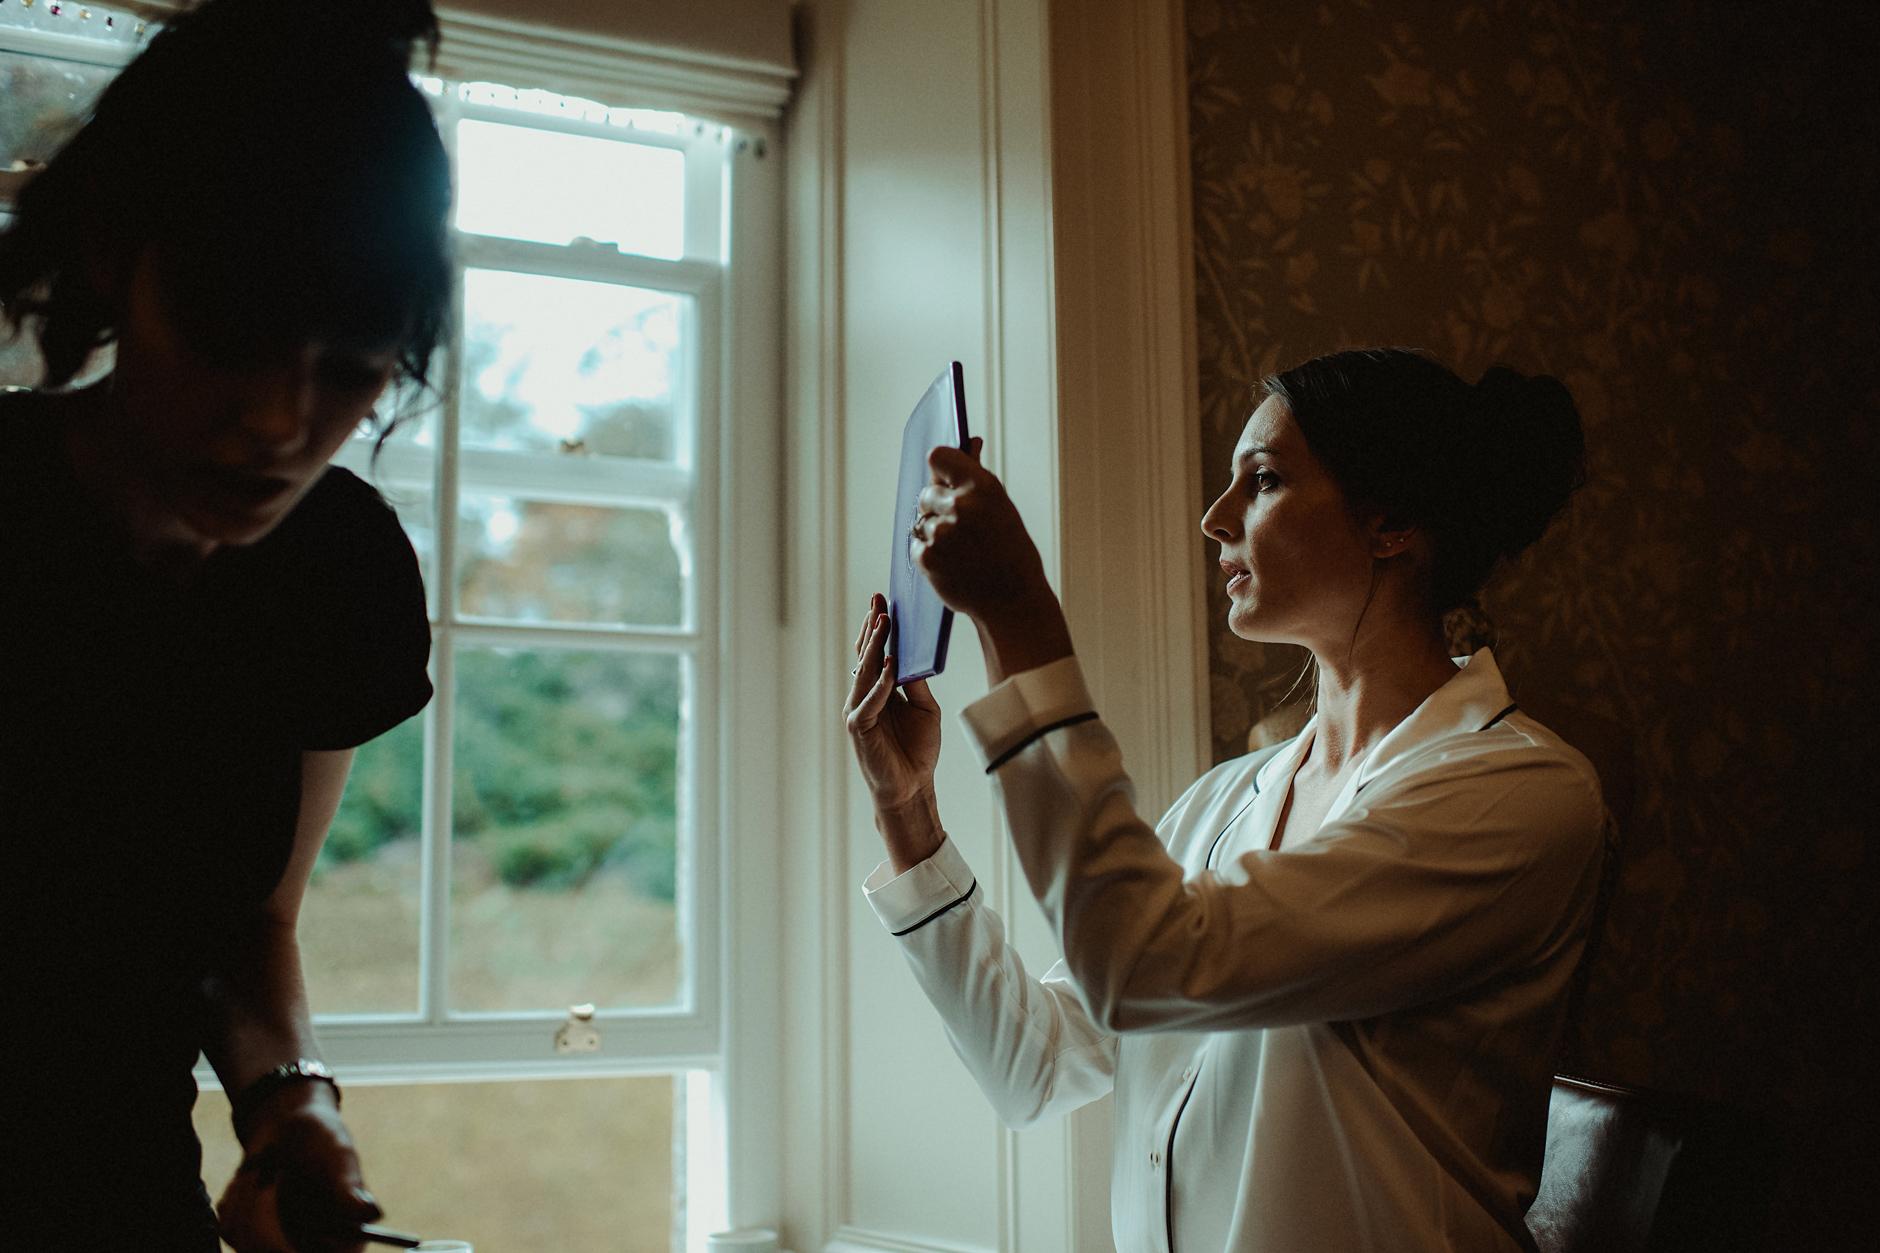 Glentruim-Wedding-Nikki-Leadbetter-Photography-33.jpg